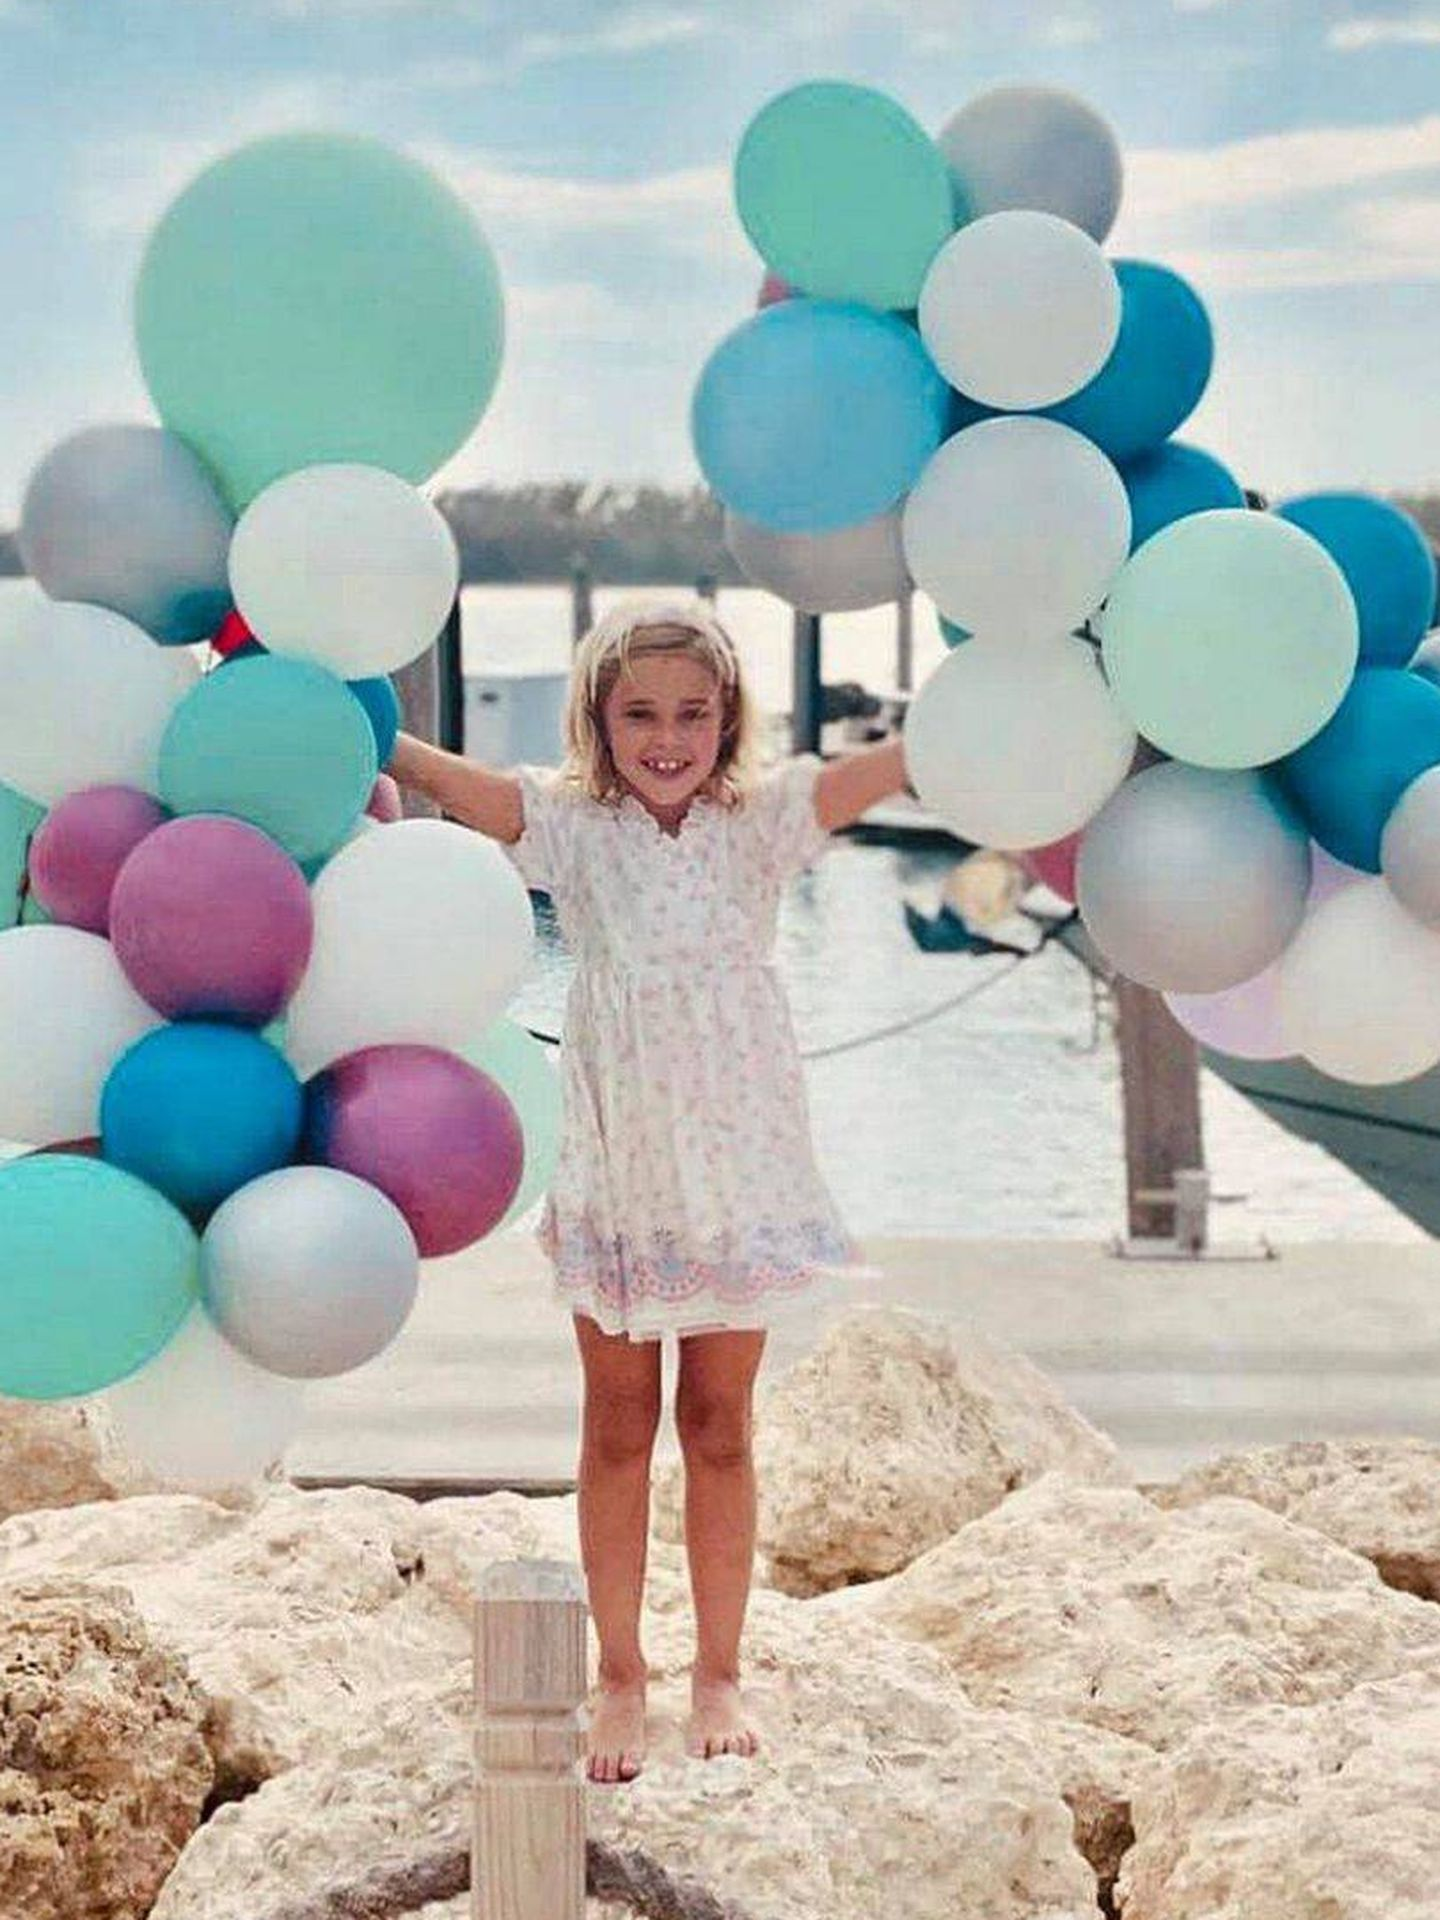 Leonore, celebrando su séptimo cumpleaños. (Facebook)